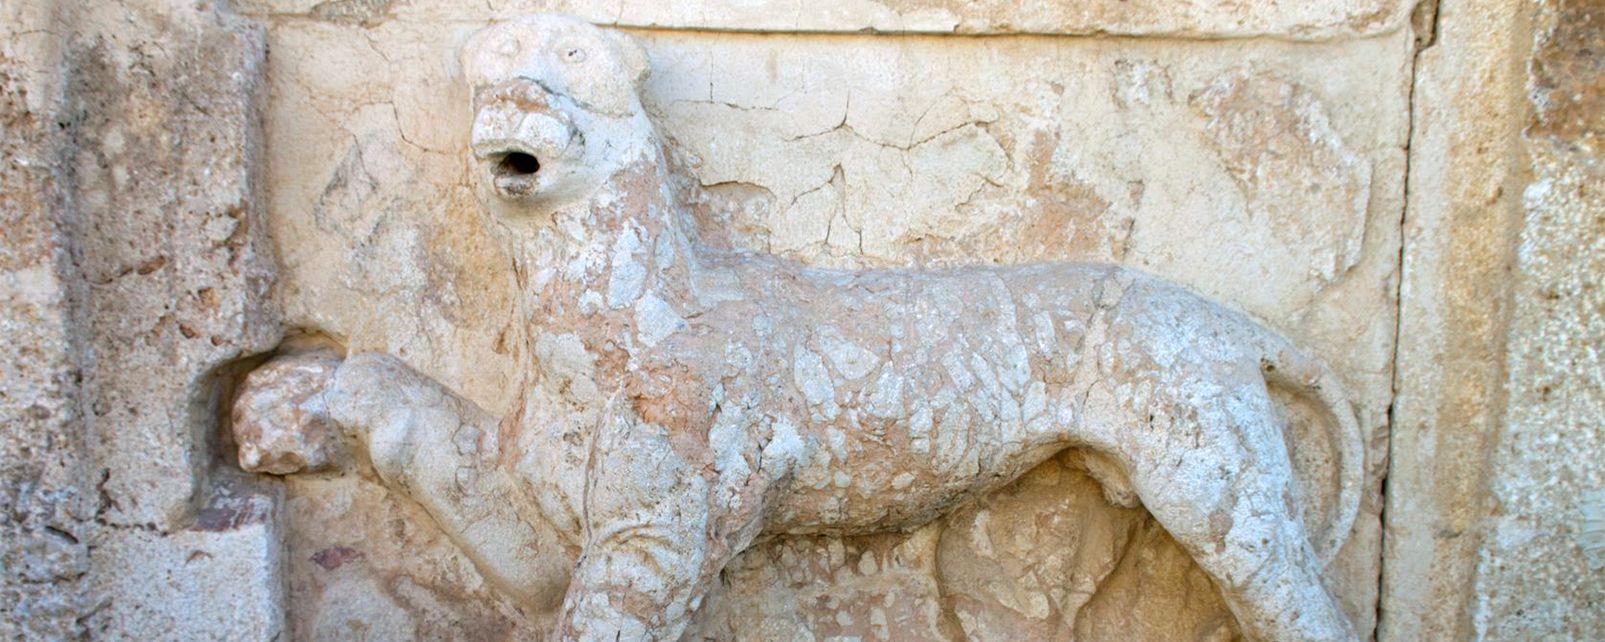 Vistas panorámicas del castillo de Iraq el Am, El castillo de Iraq el Amir, Los monumentos, Jordania